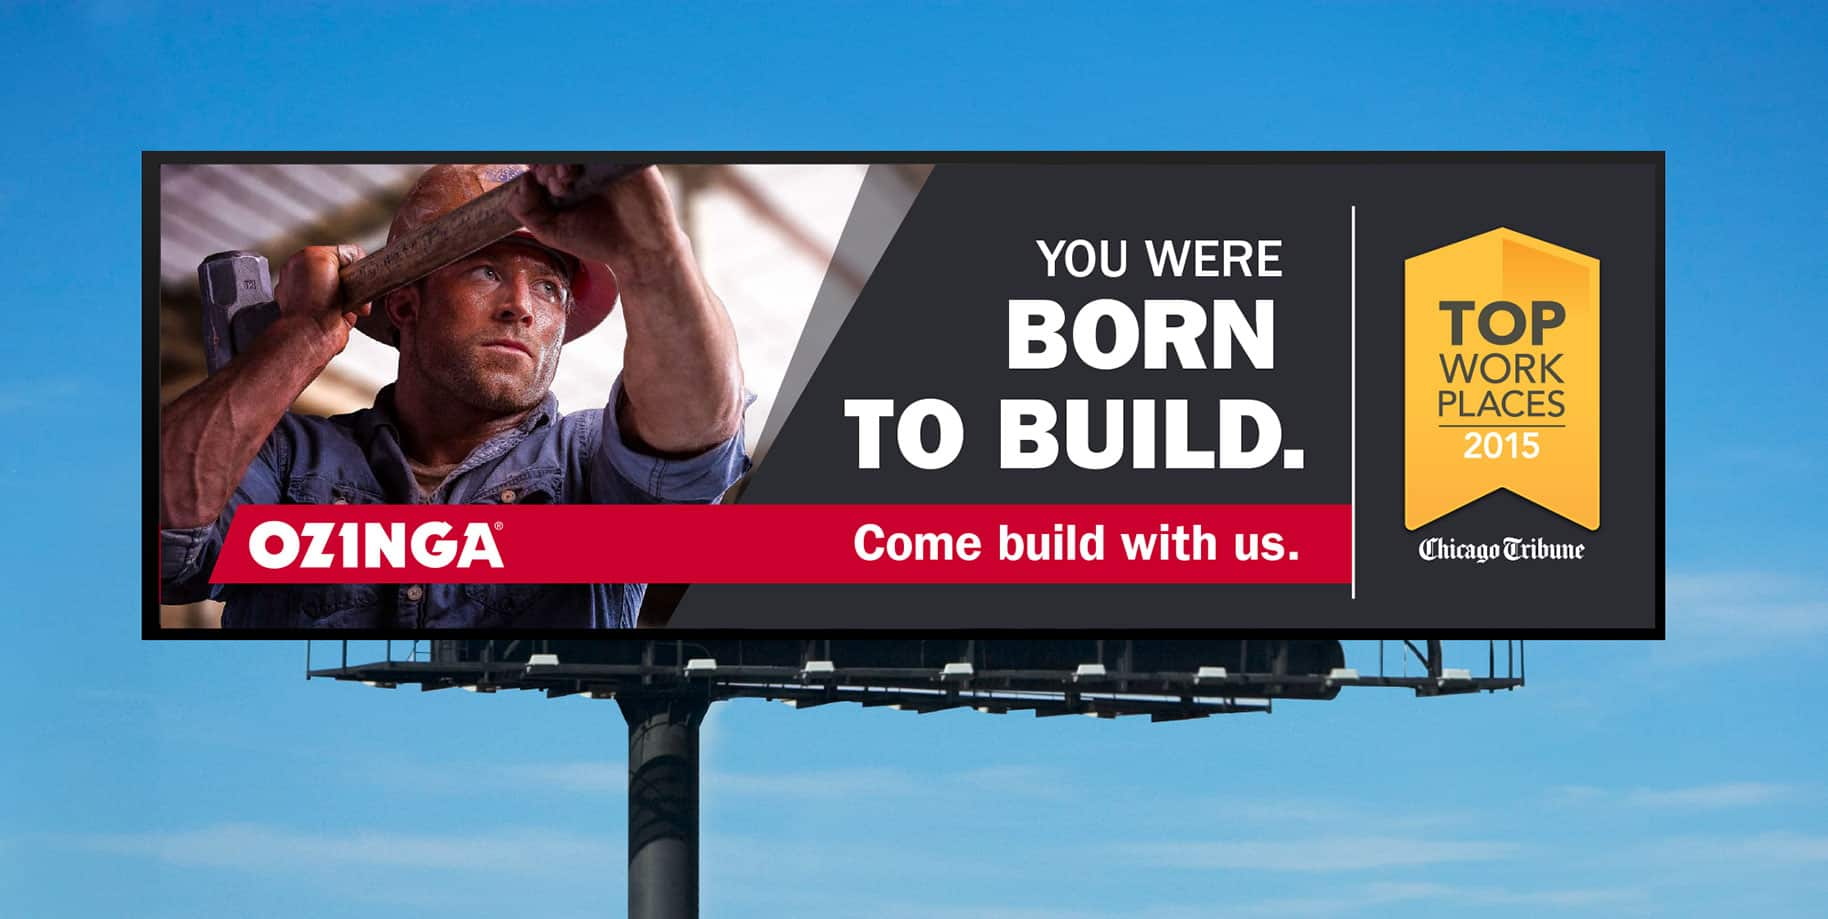 Ozinga born to build billboard